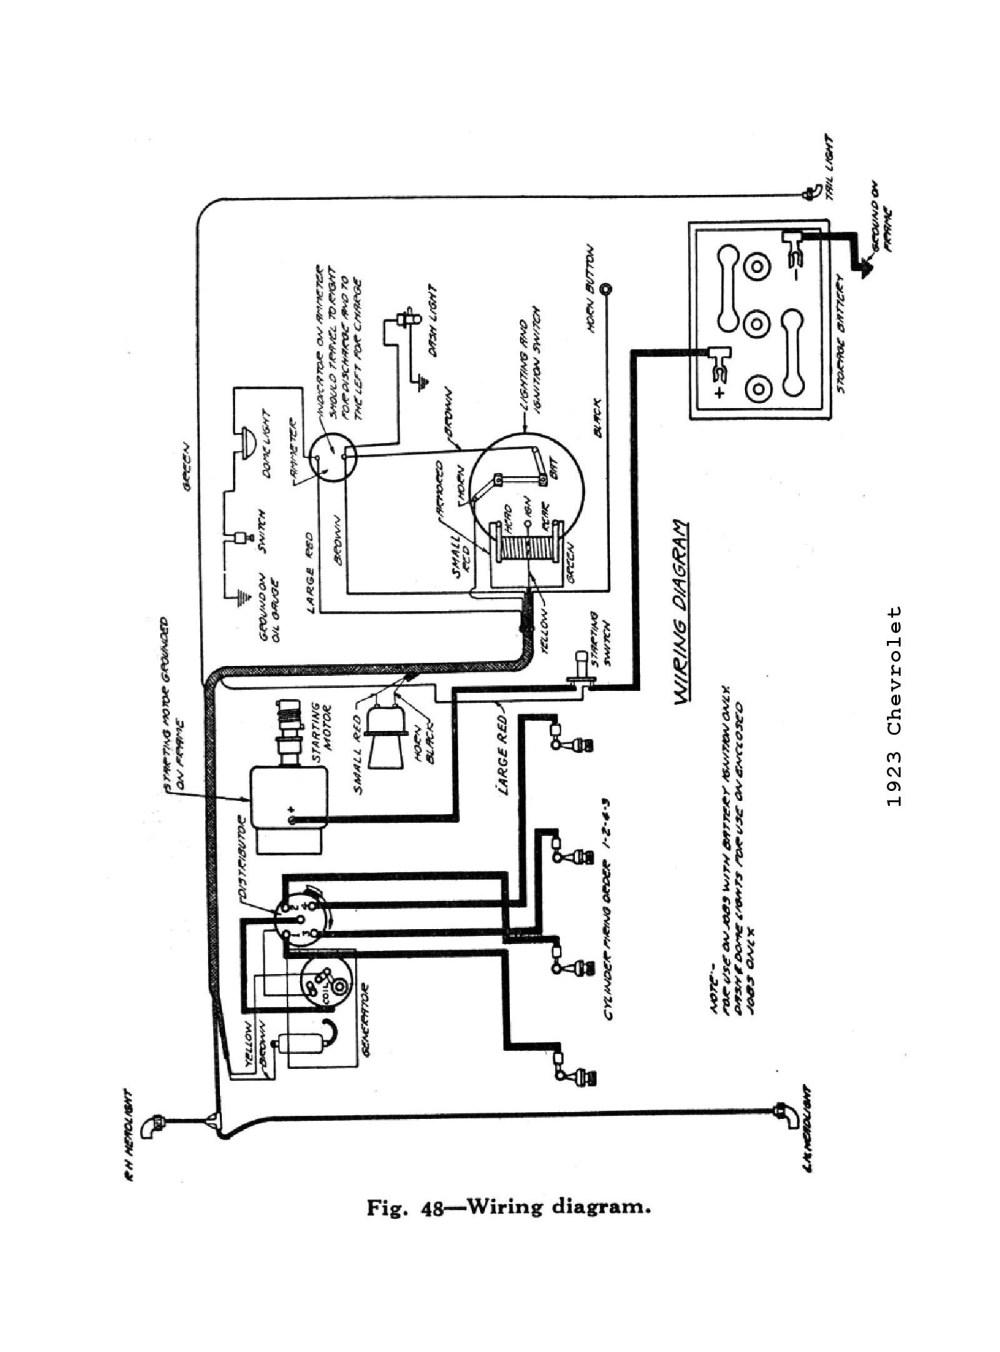 medium resolution of 67 72 chevy truck wiring diagram 1977 chevy truck alternator wiring 72 chevy wiring diagram 1977